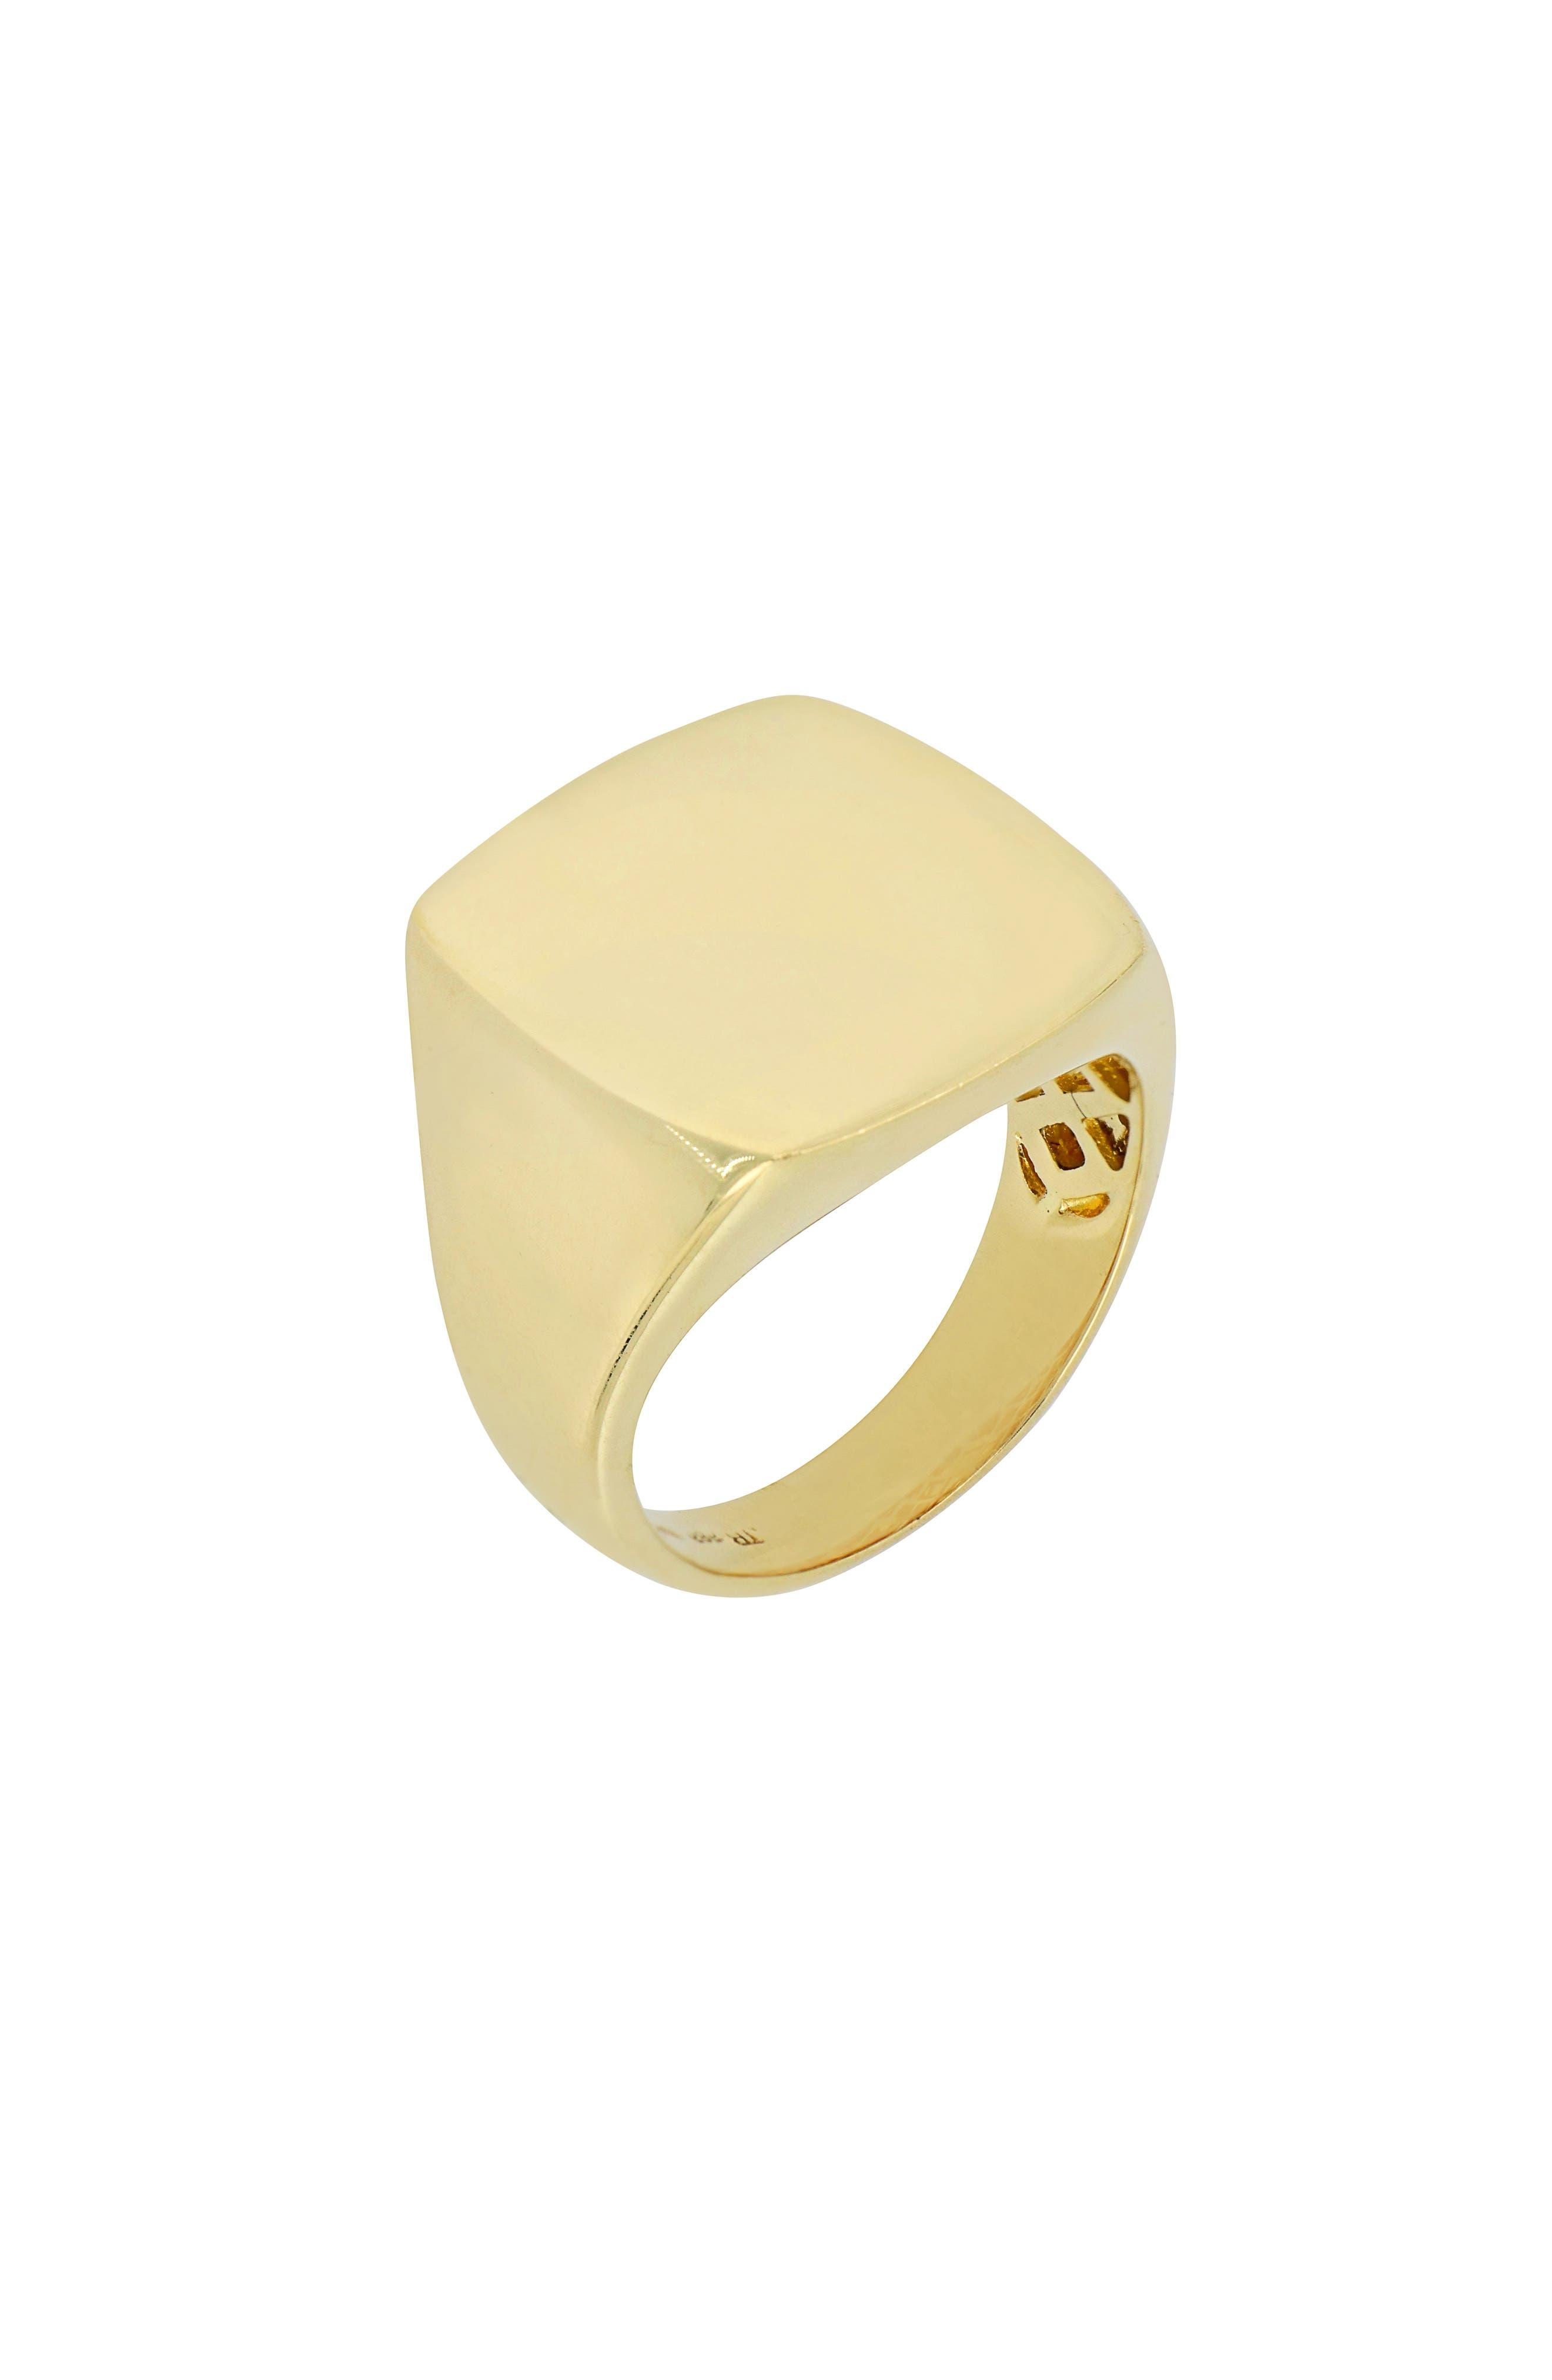 Square Signet Ring,                             Main thumbnail 1, color,                             710